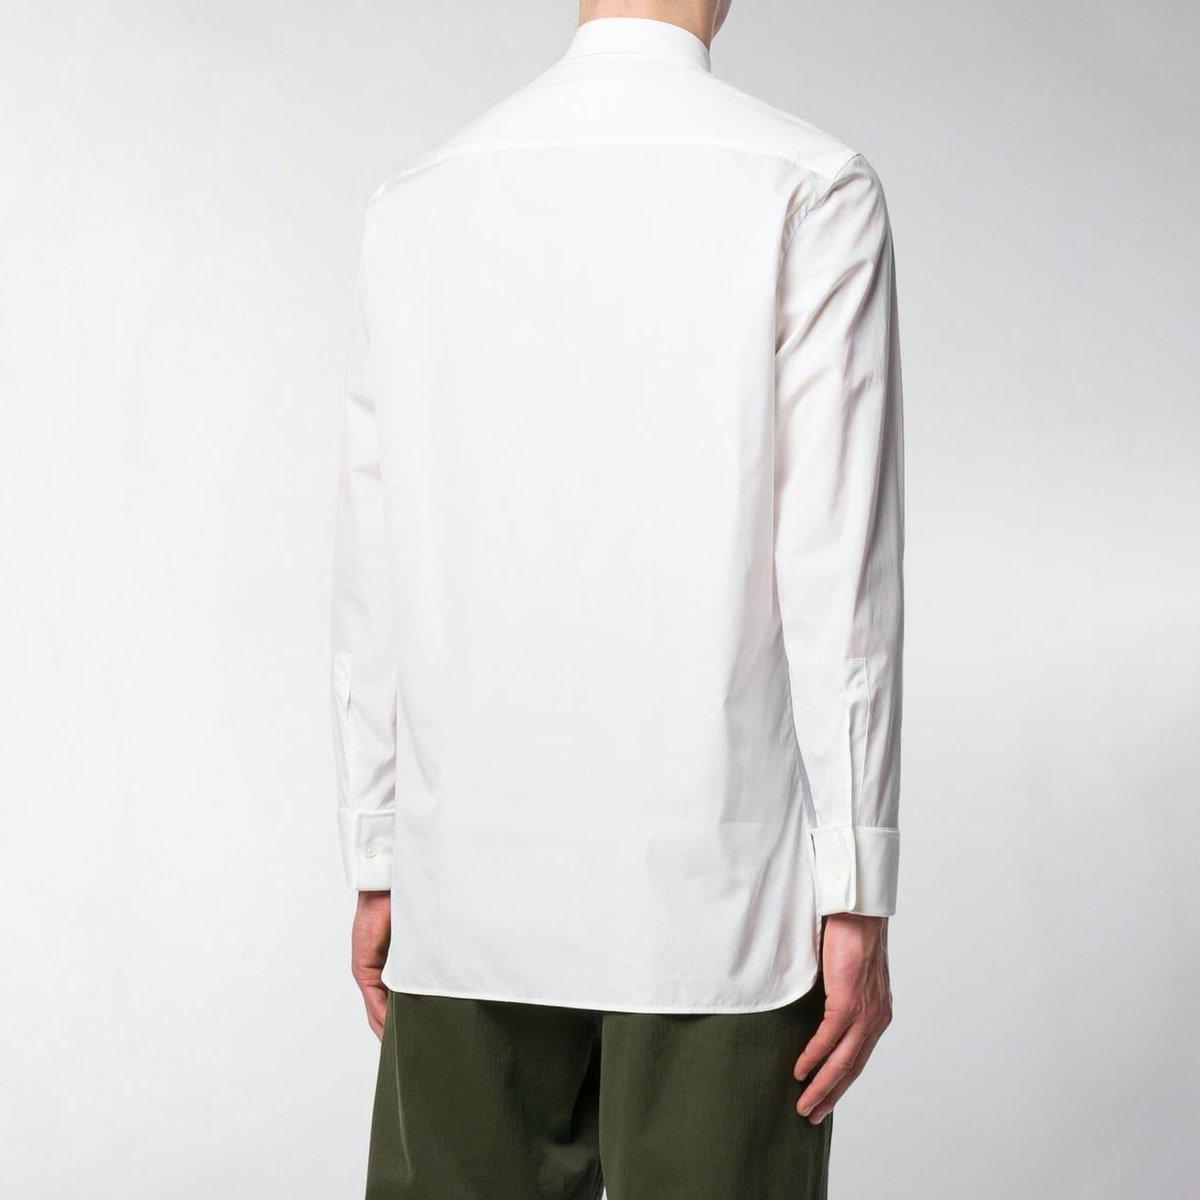 maison-martin-margiela-100-WHITE-Concealed-Button-Shirt (3).jpg